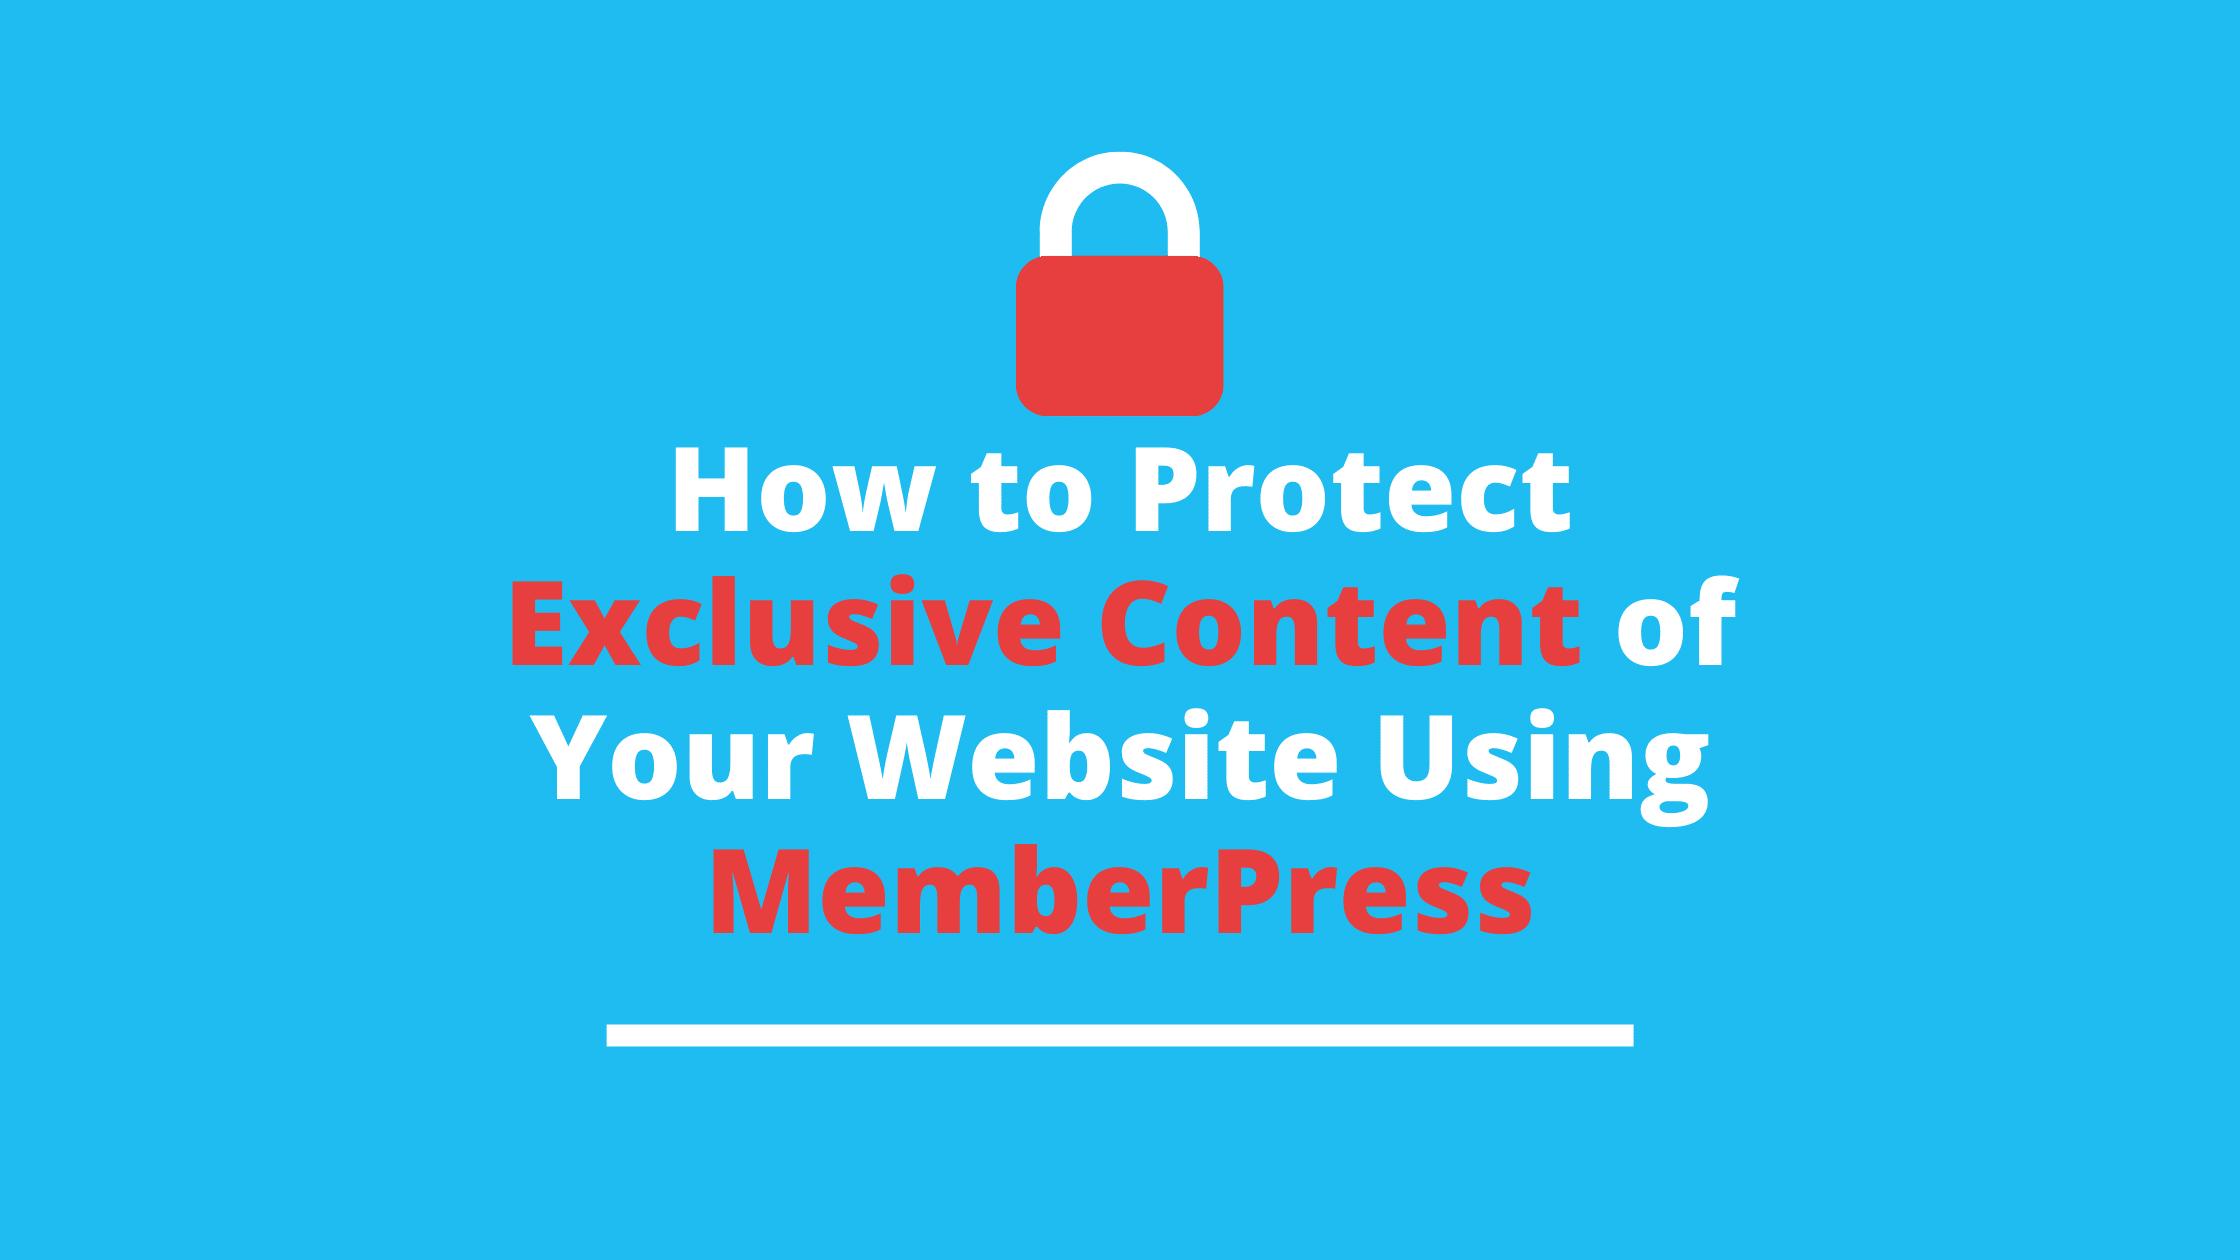 Content Protection Rule using MemberPress